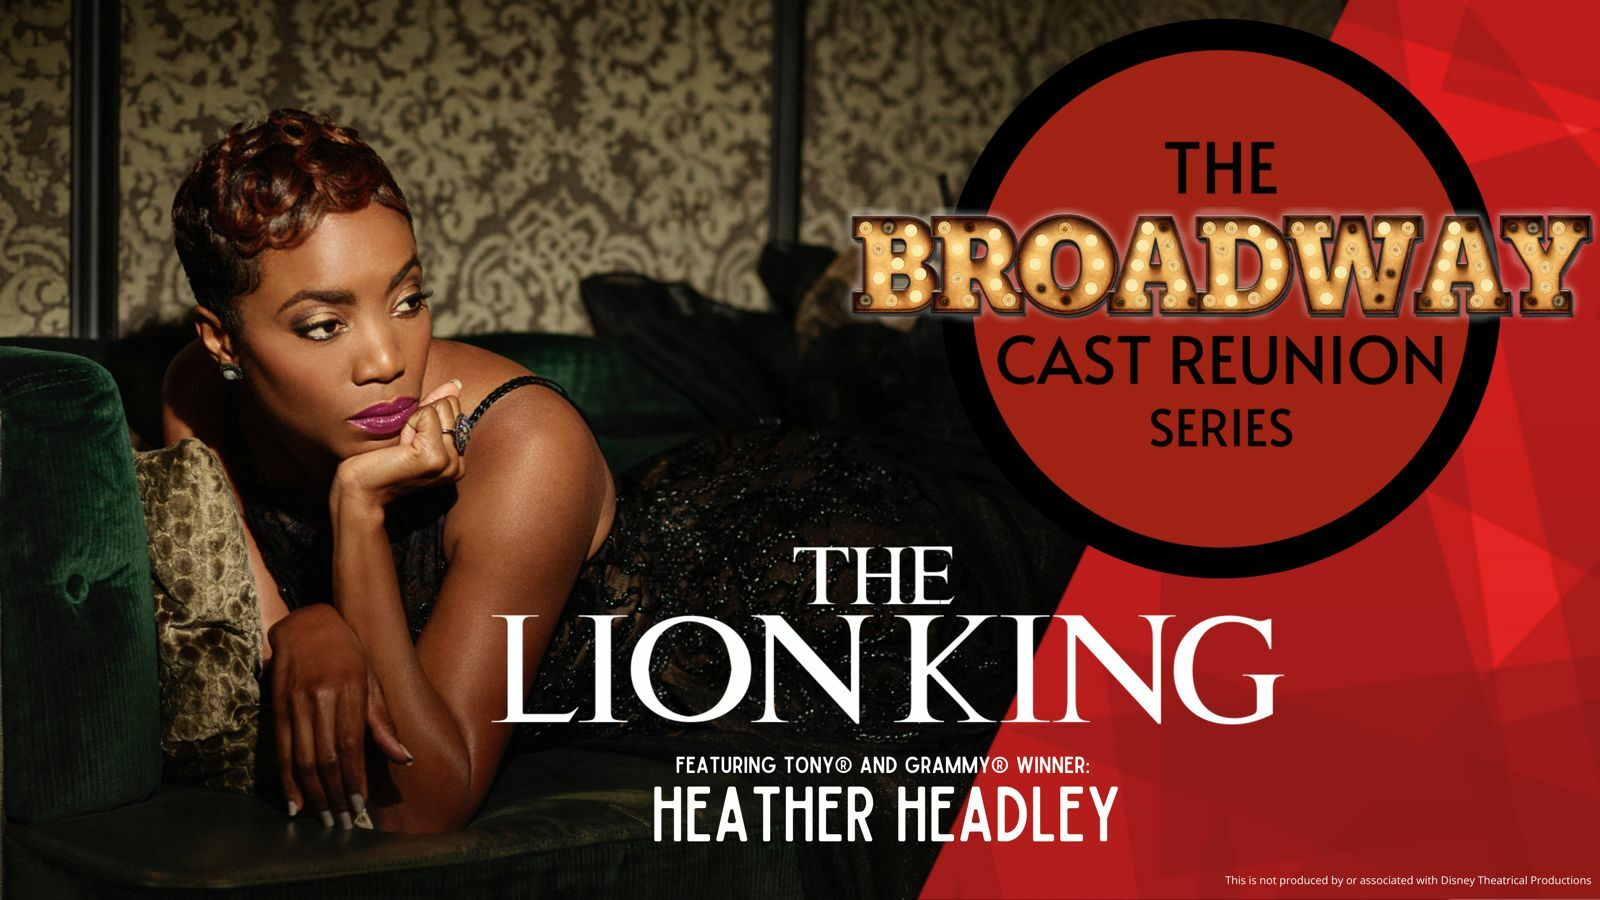 The Broadway Cast Reunion Series: